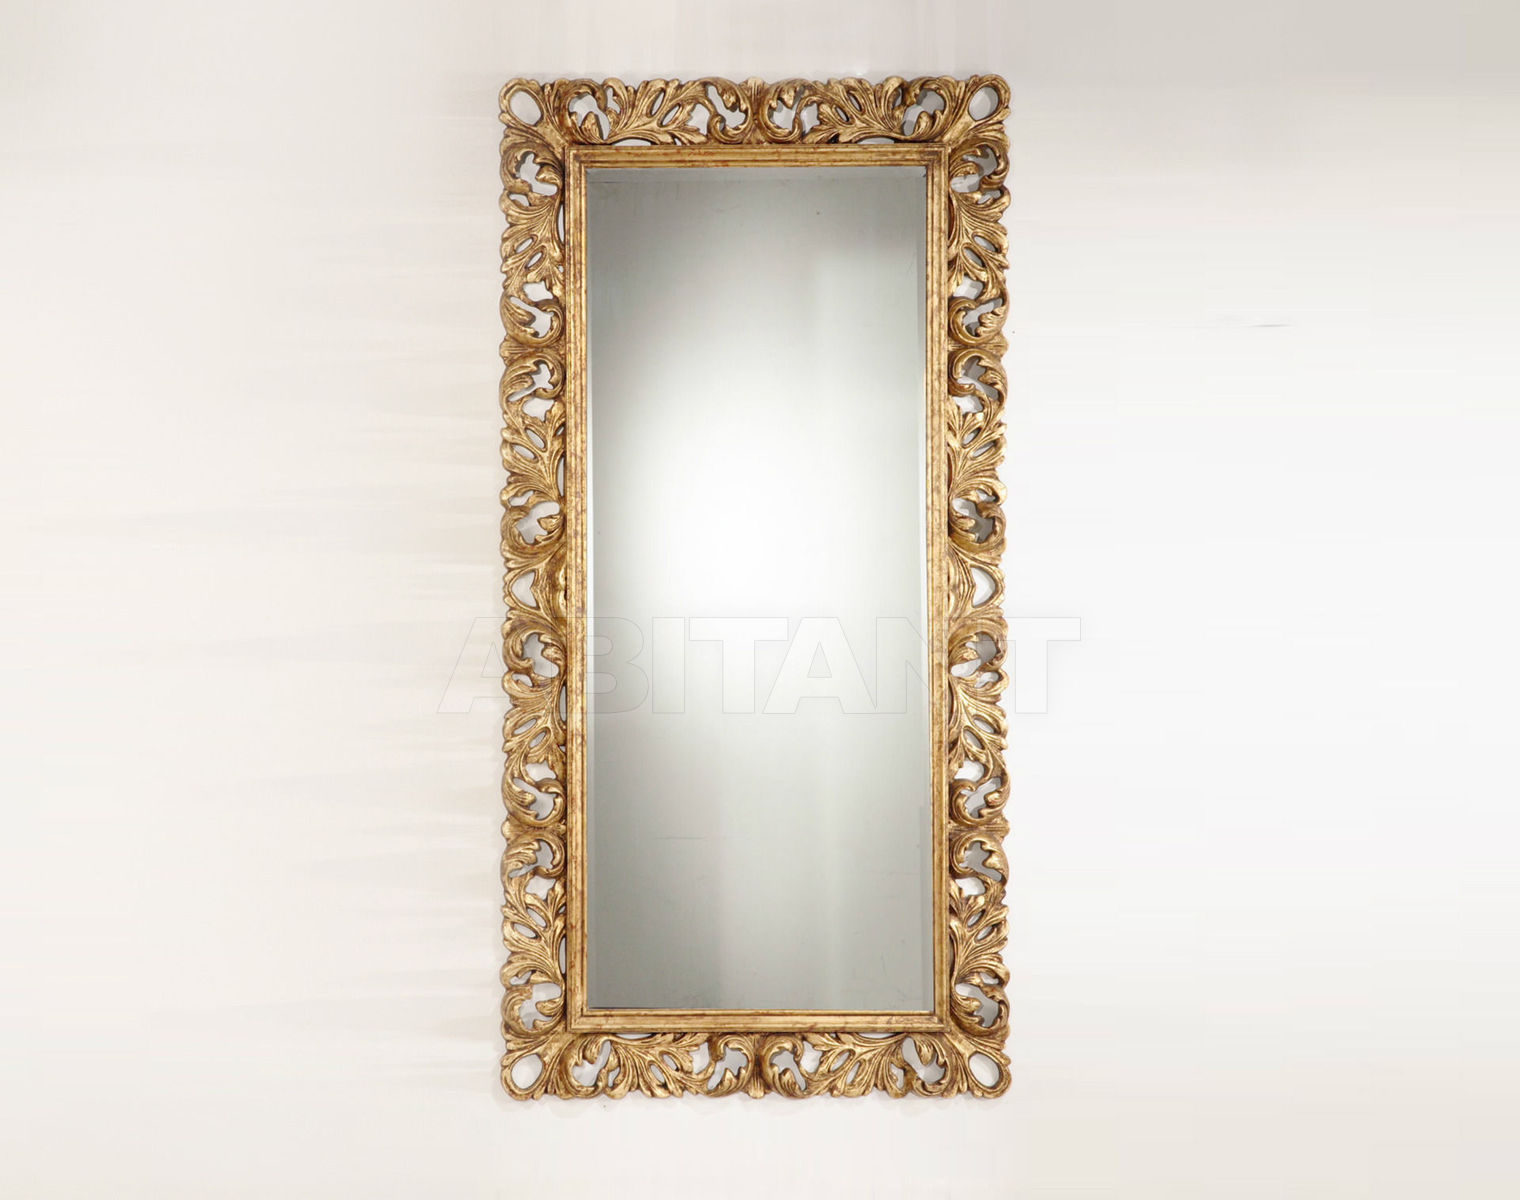 Купить Зеркало настенное Princess small RM Arredamenti - Capricio Capricio 9906.F104